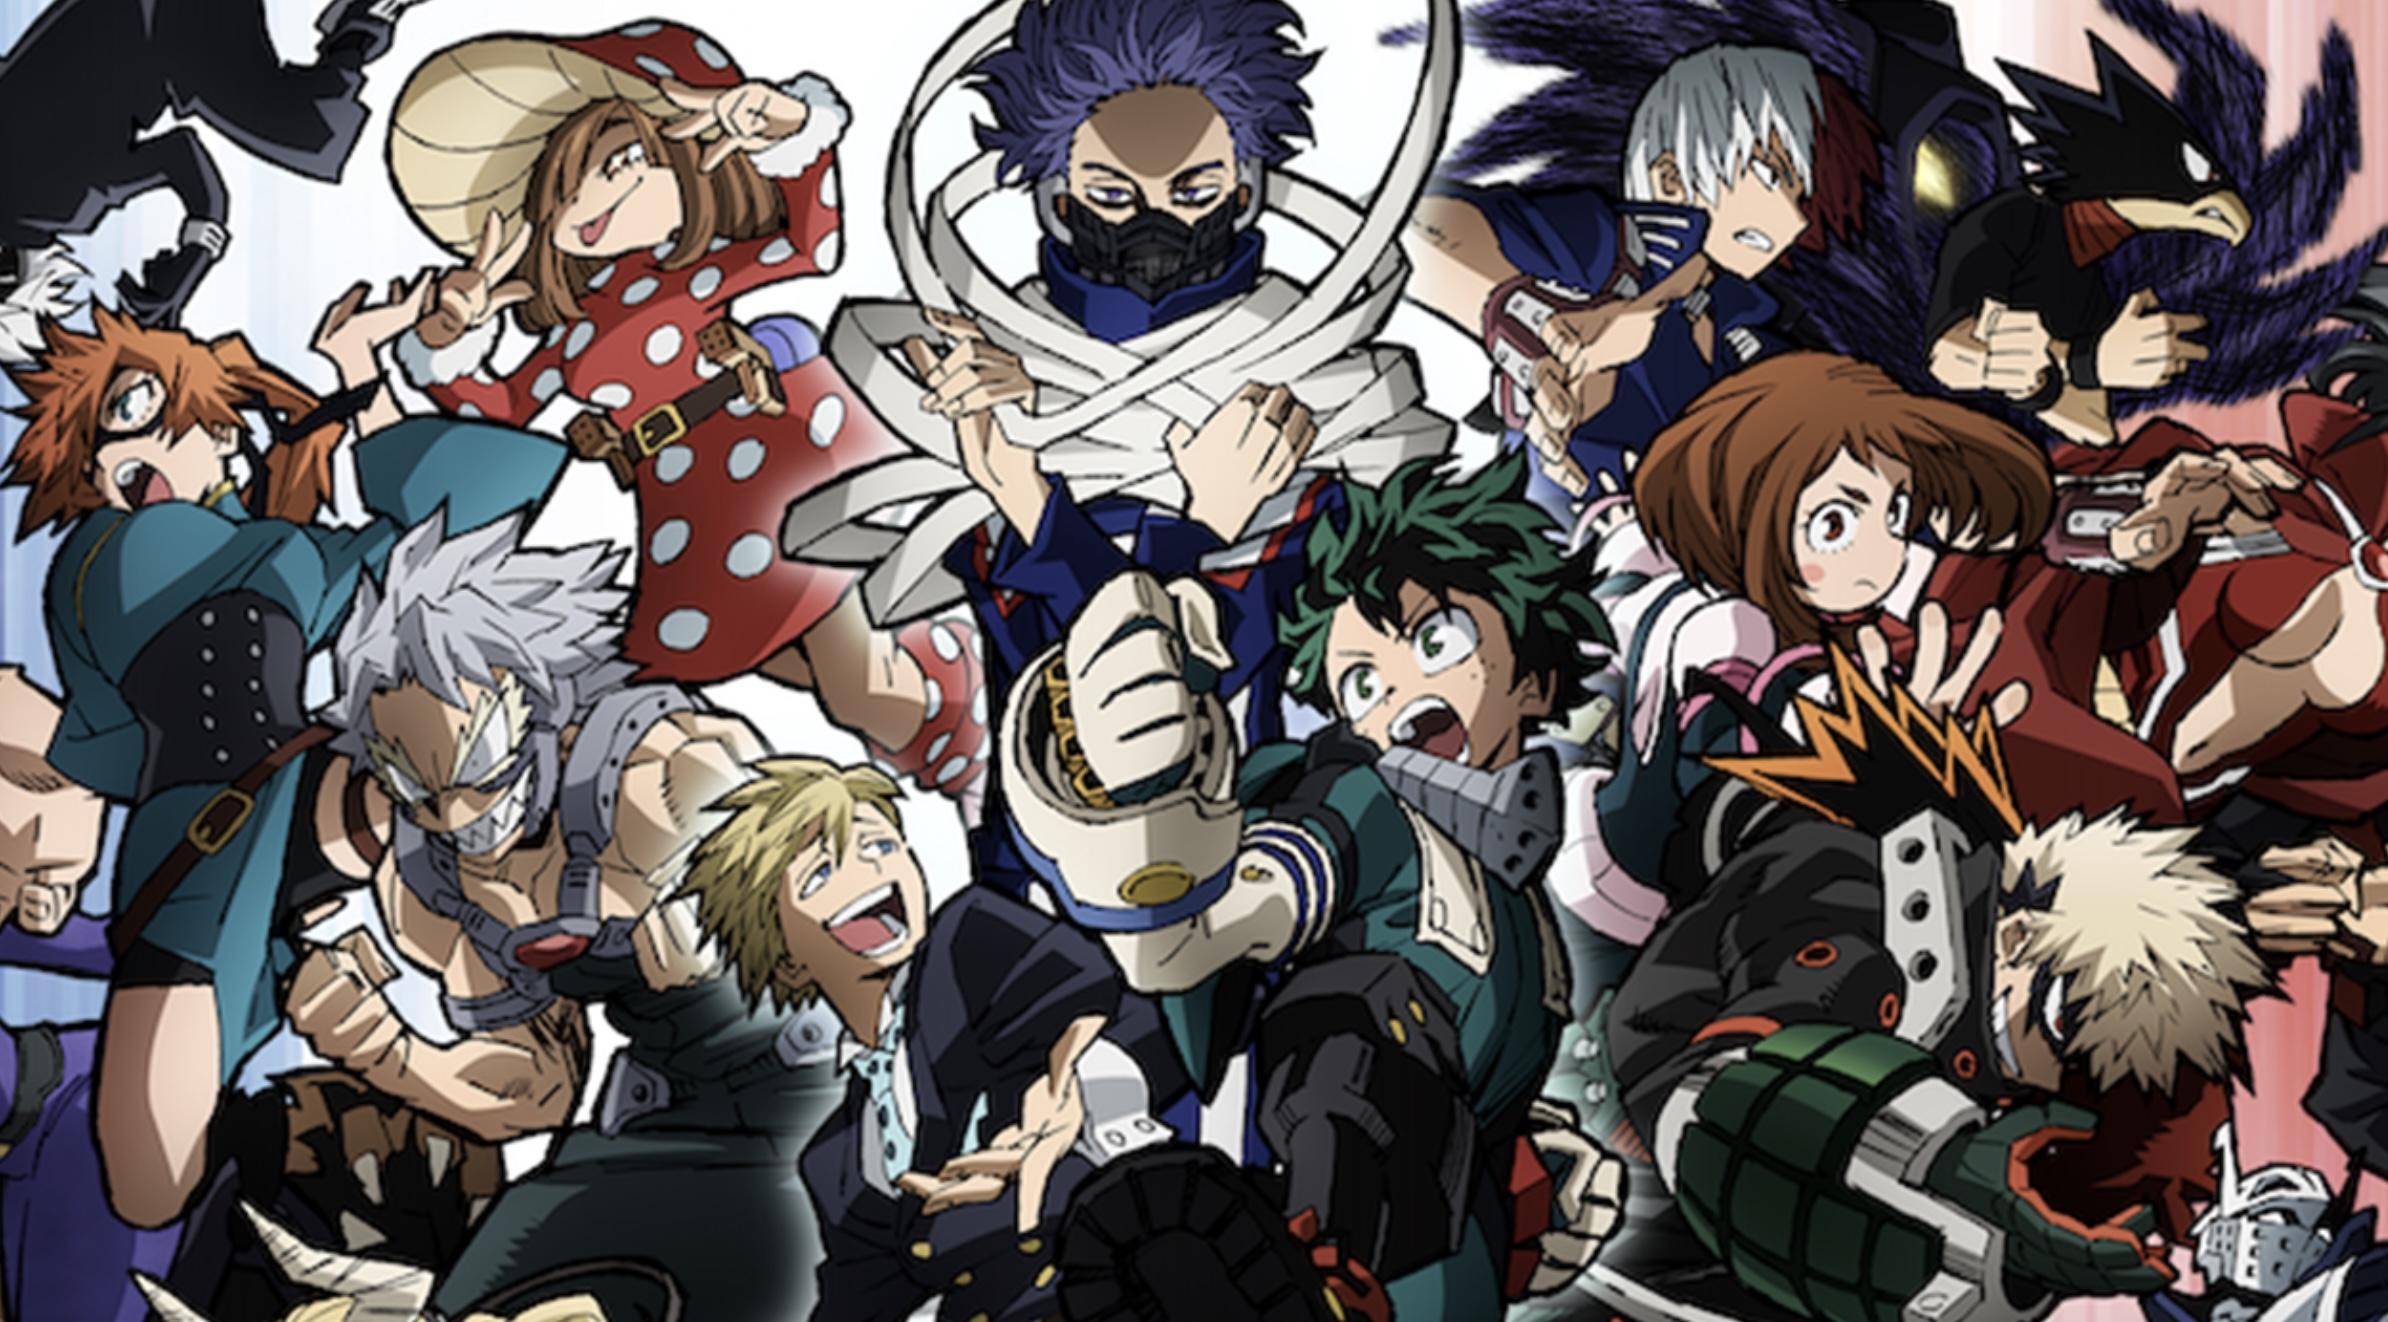 My Hero Academia 5 Episode 23: Release Date, English Dub, Watch Online